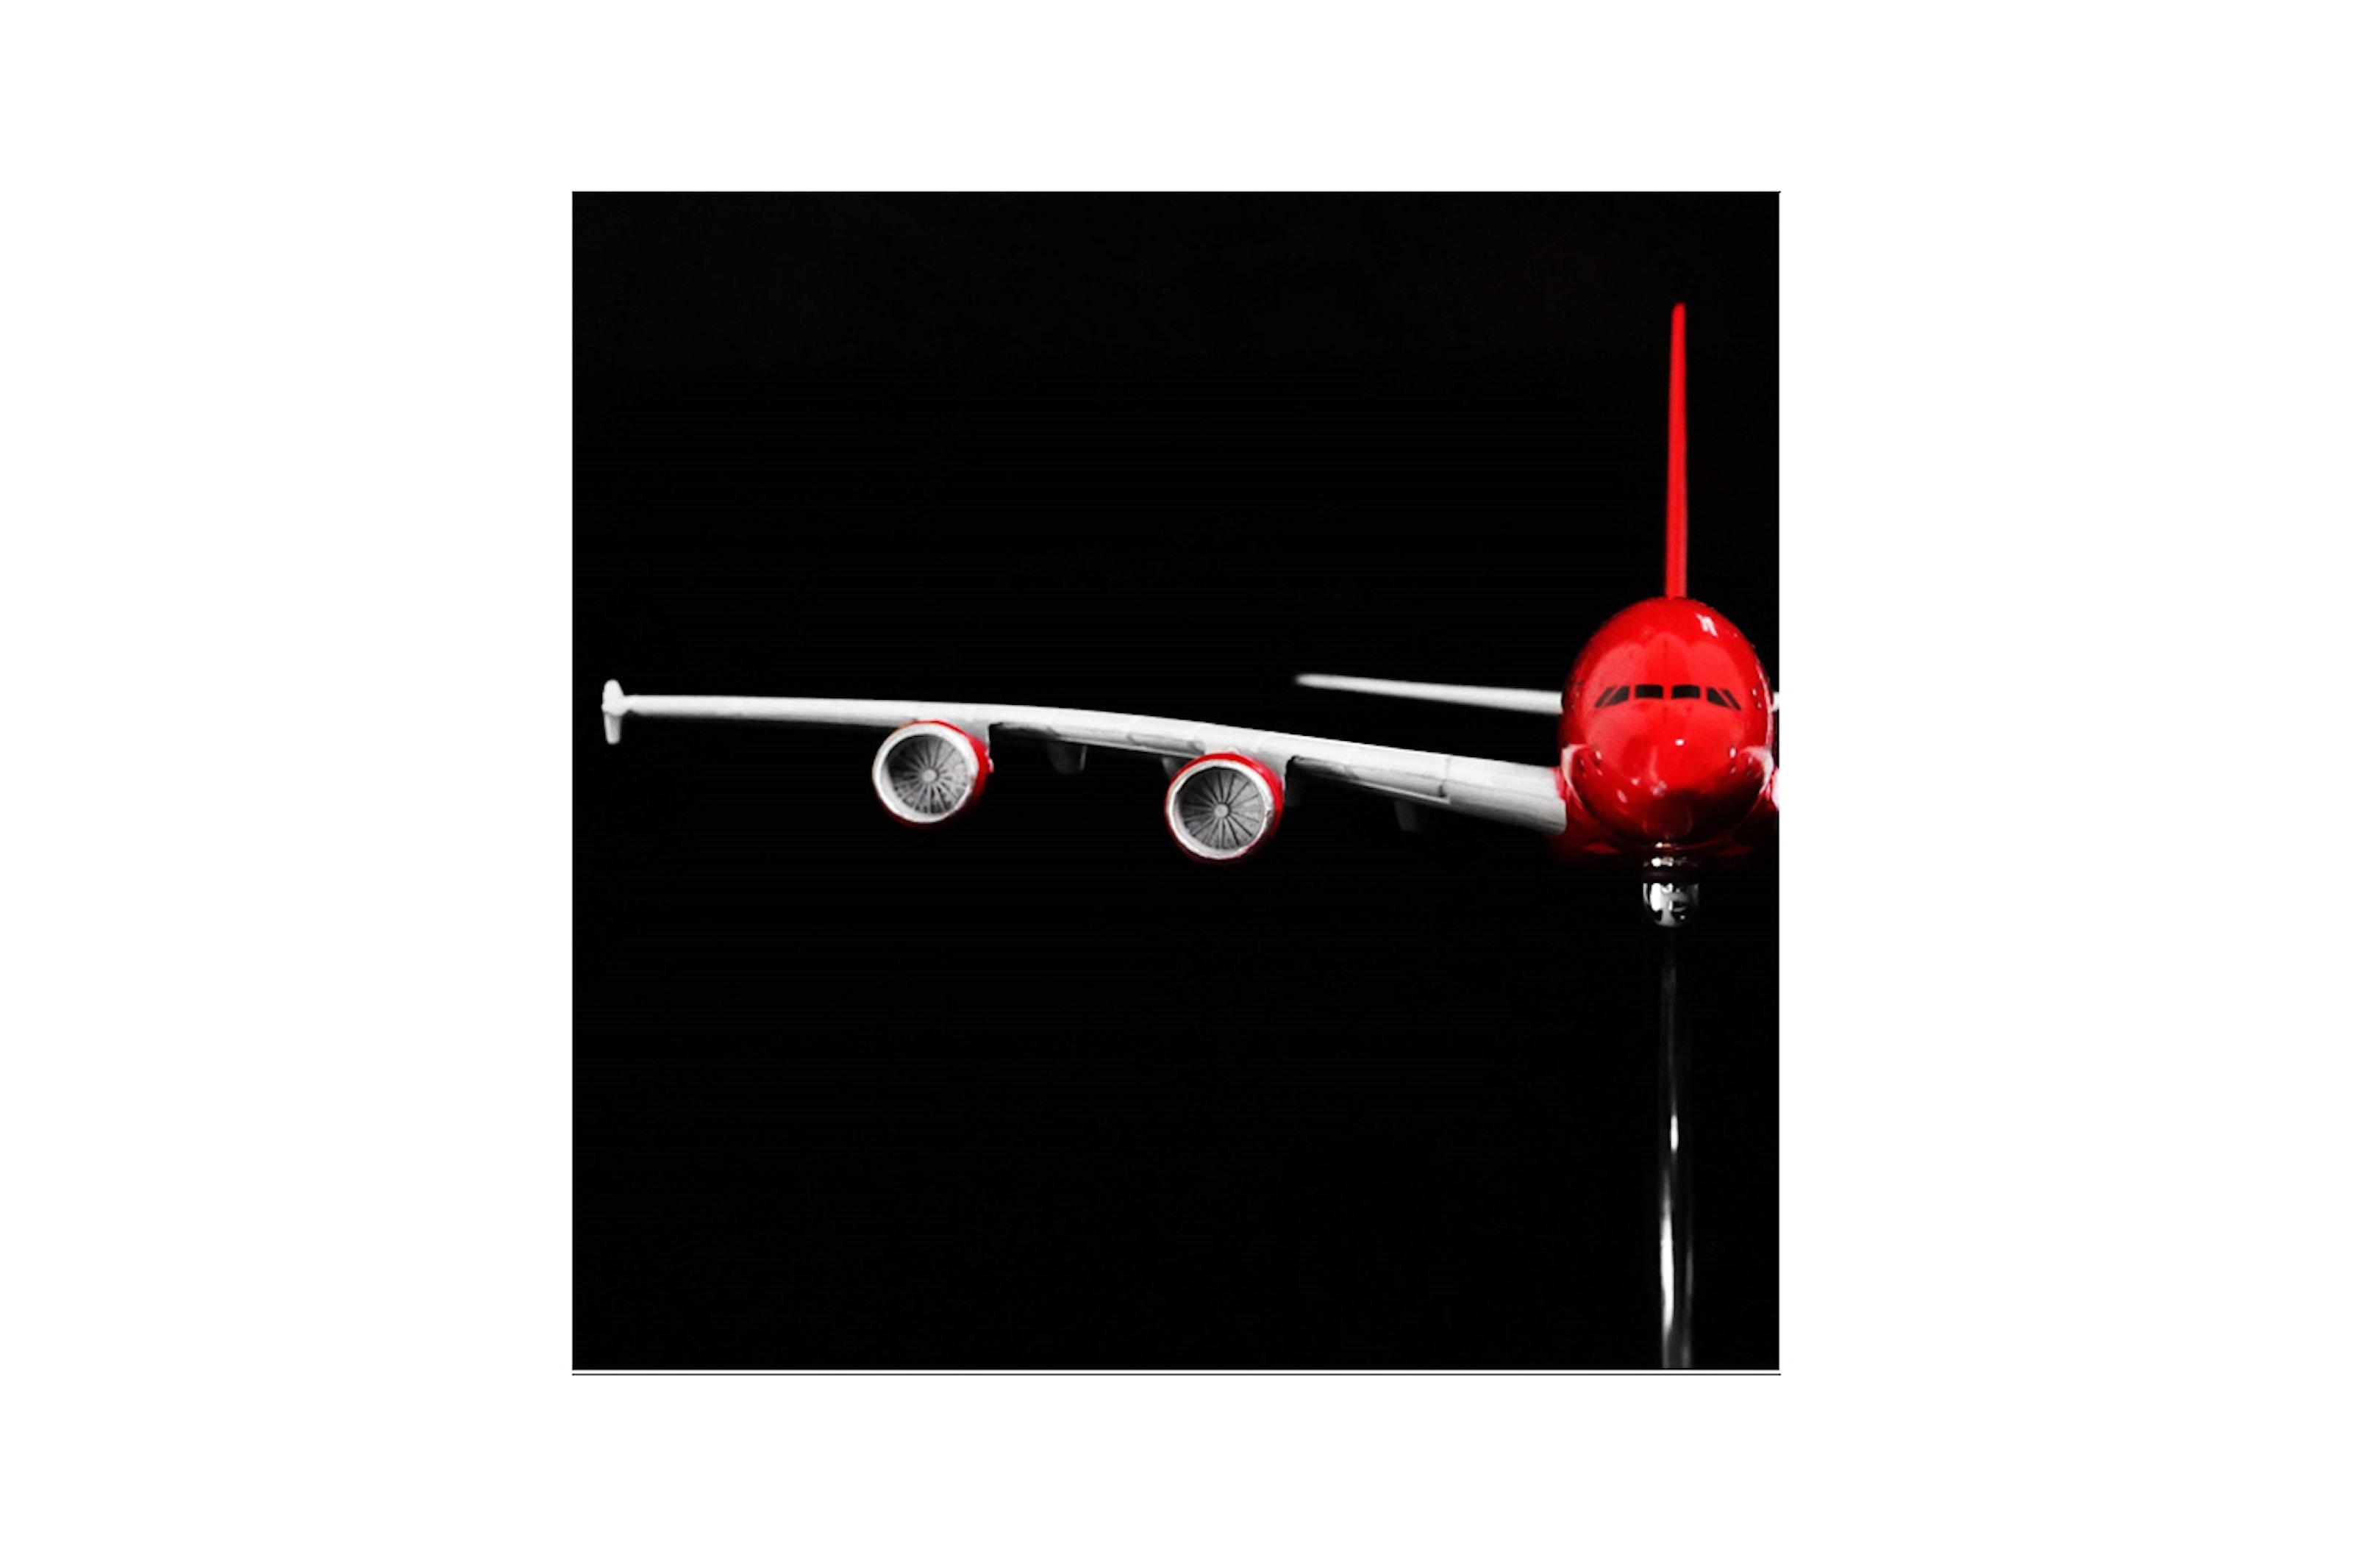 Airbus A380 Coca Cola Modellfly